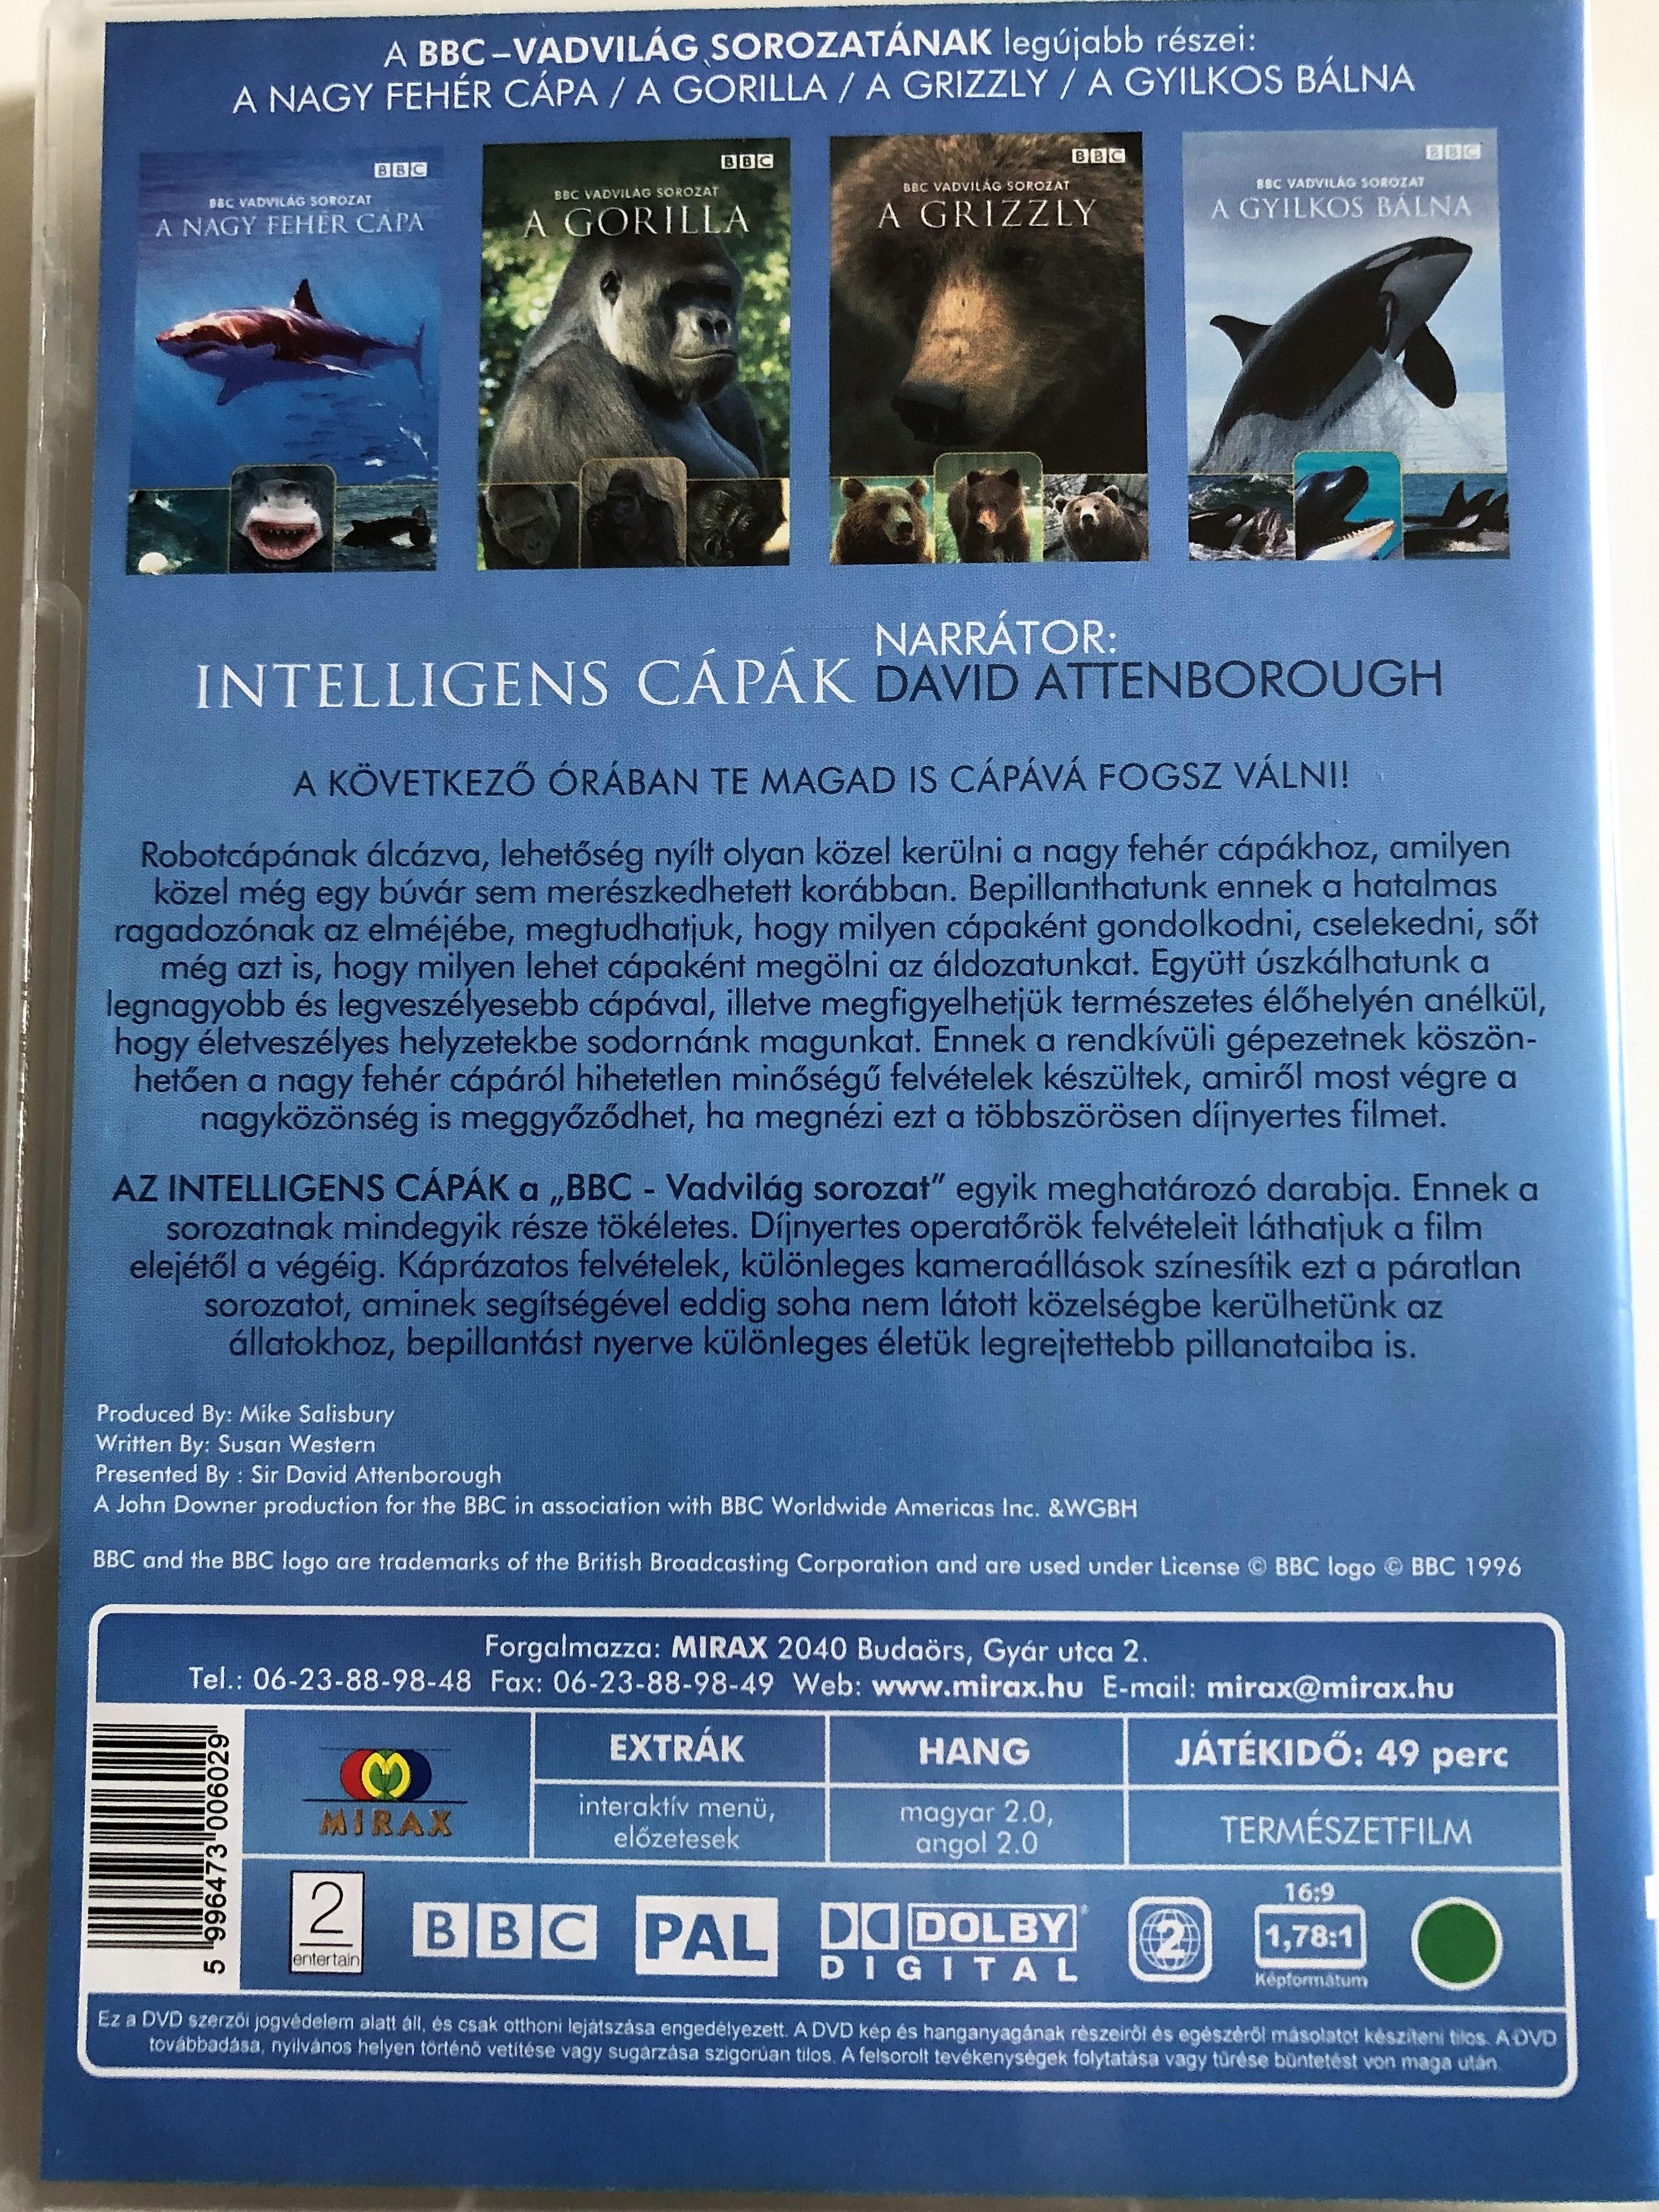 intelligens-c-p-k-smart-sharks-swimming-with-roboshark-bbc-wildlife-series-narrated-by-sir-david-attenborough-dvd-2003-bbc-vadvil-g-sorozat-2-.jpg